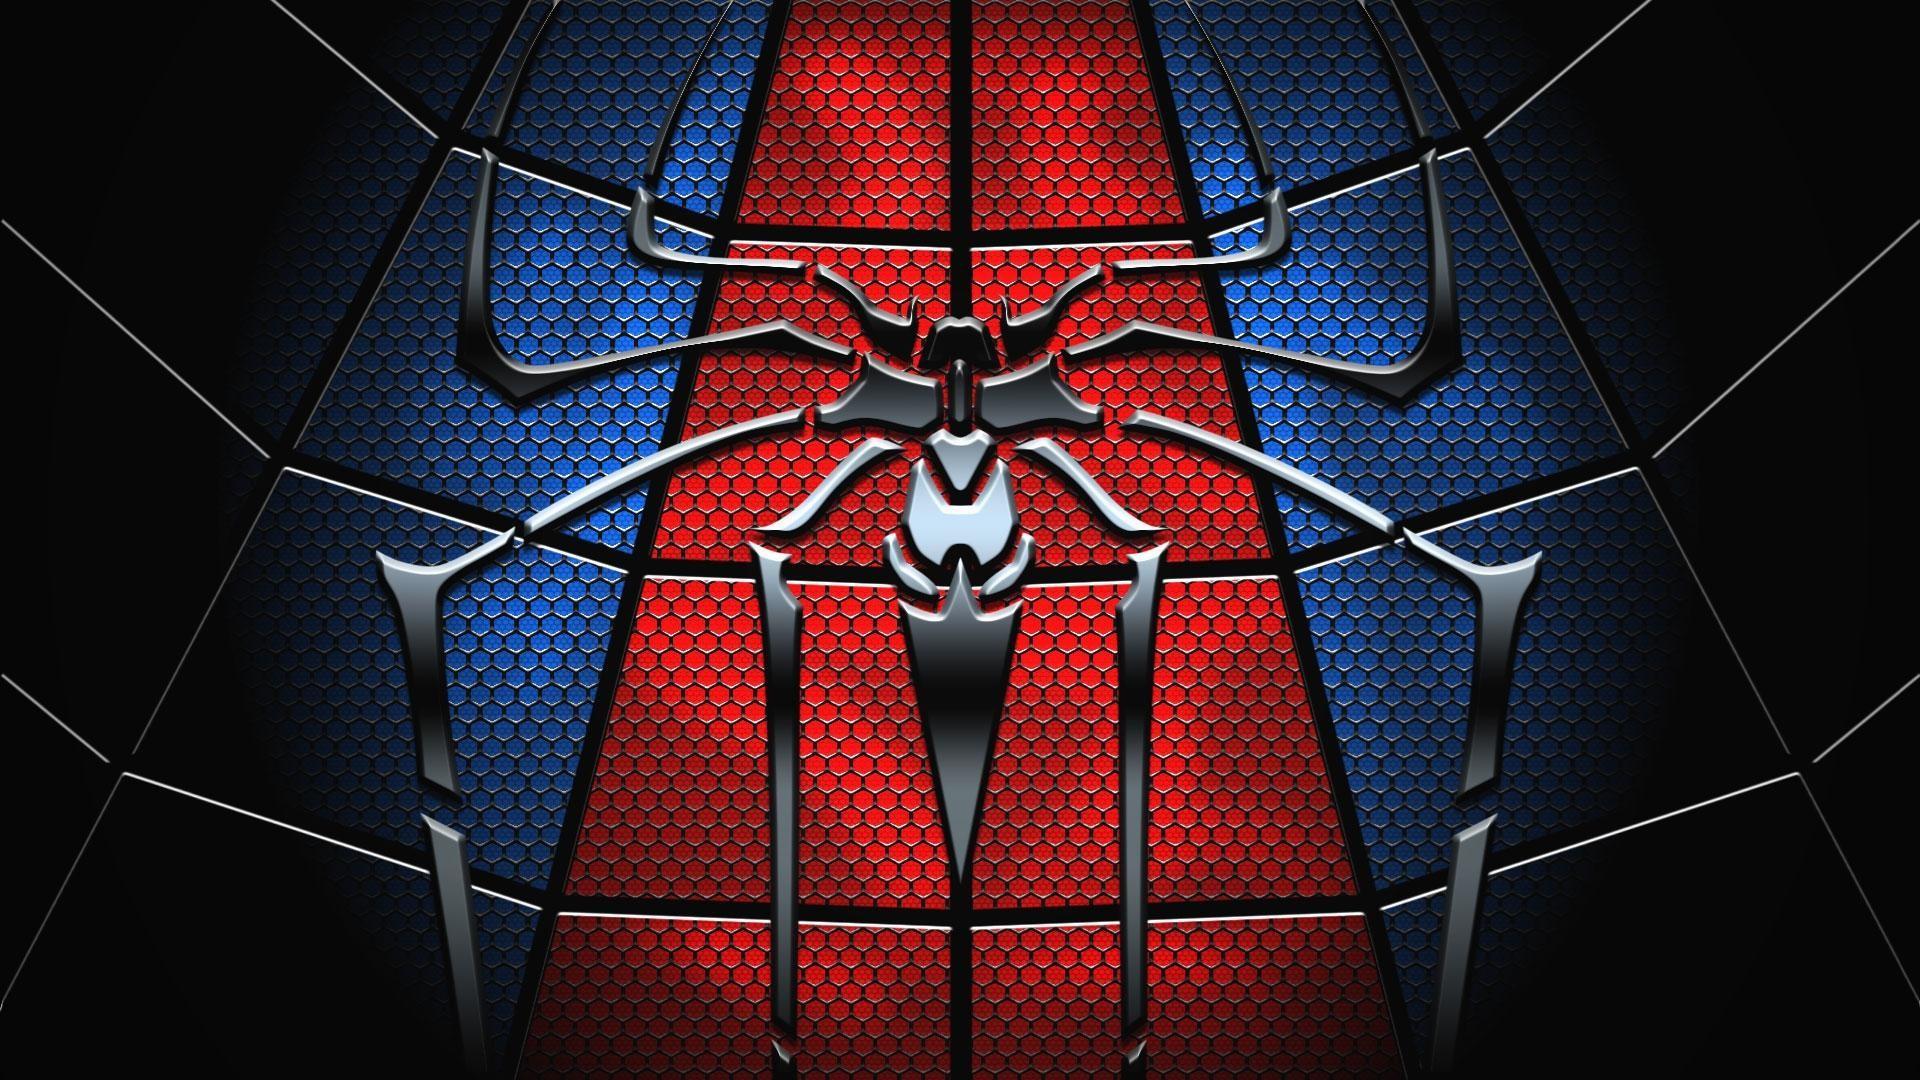 wallpaper.wiki-Spiderman-Image-PIC-WPD007628